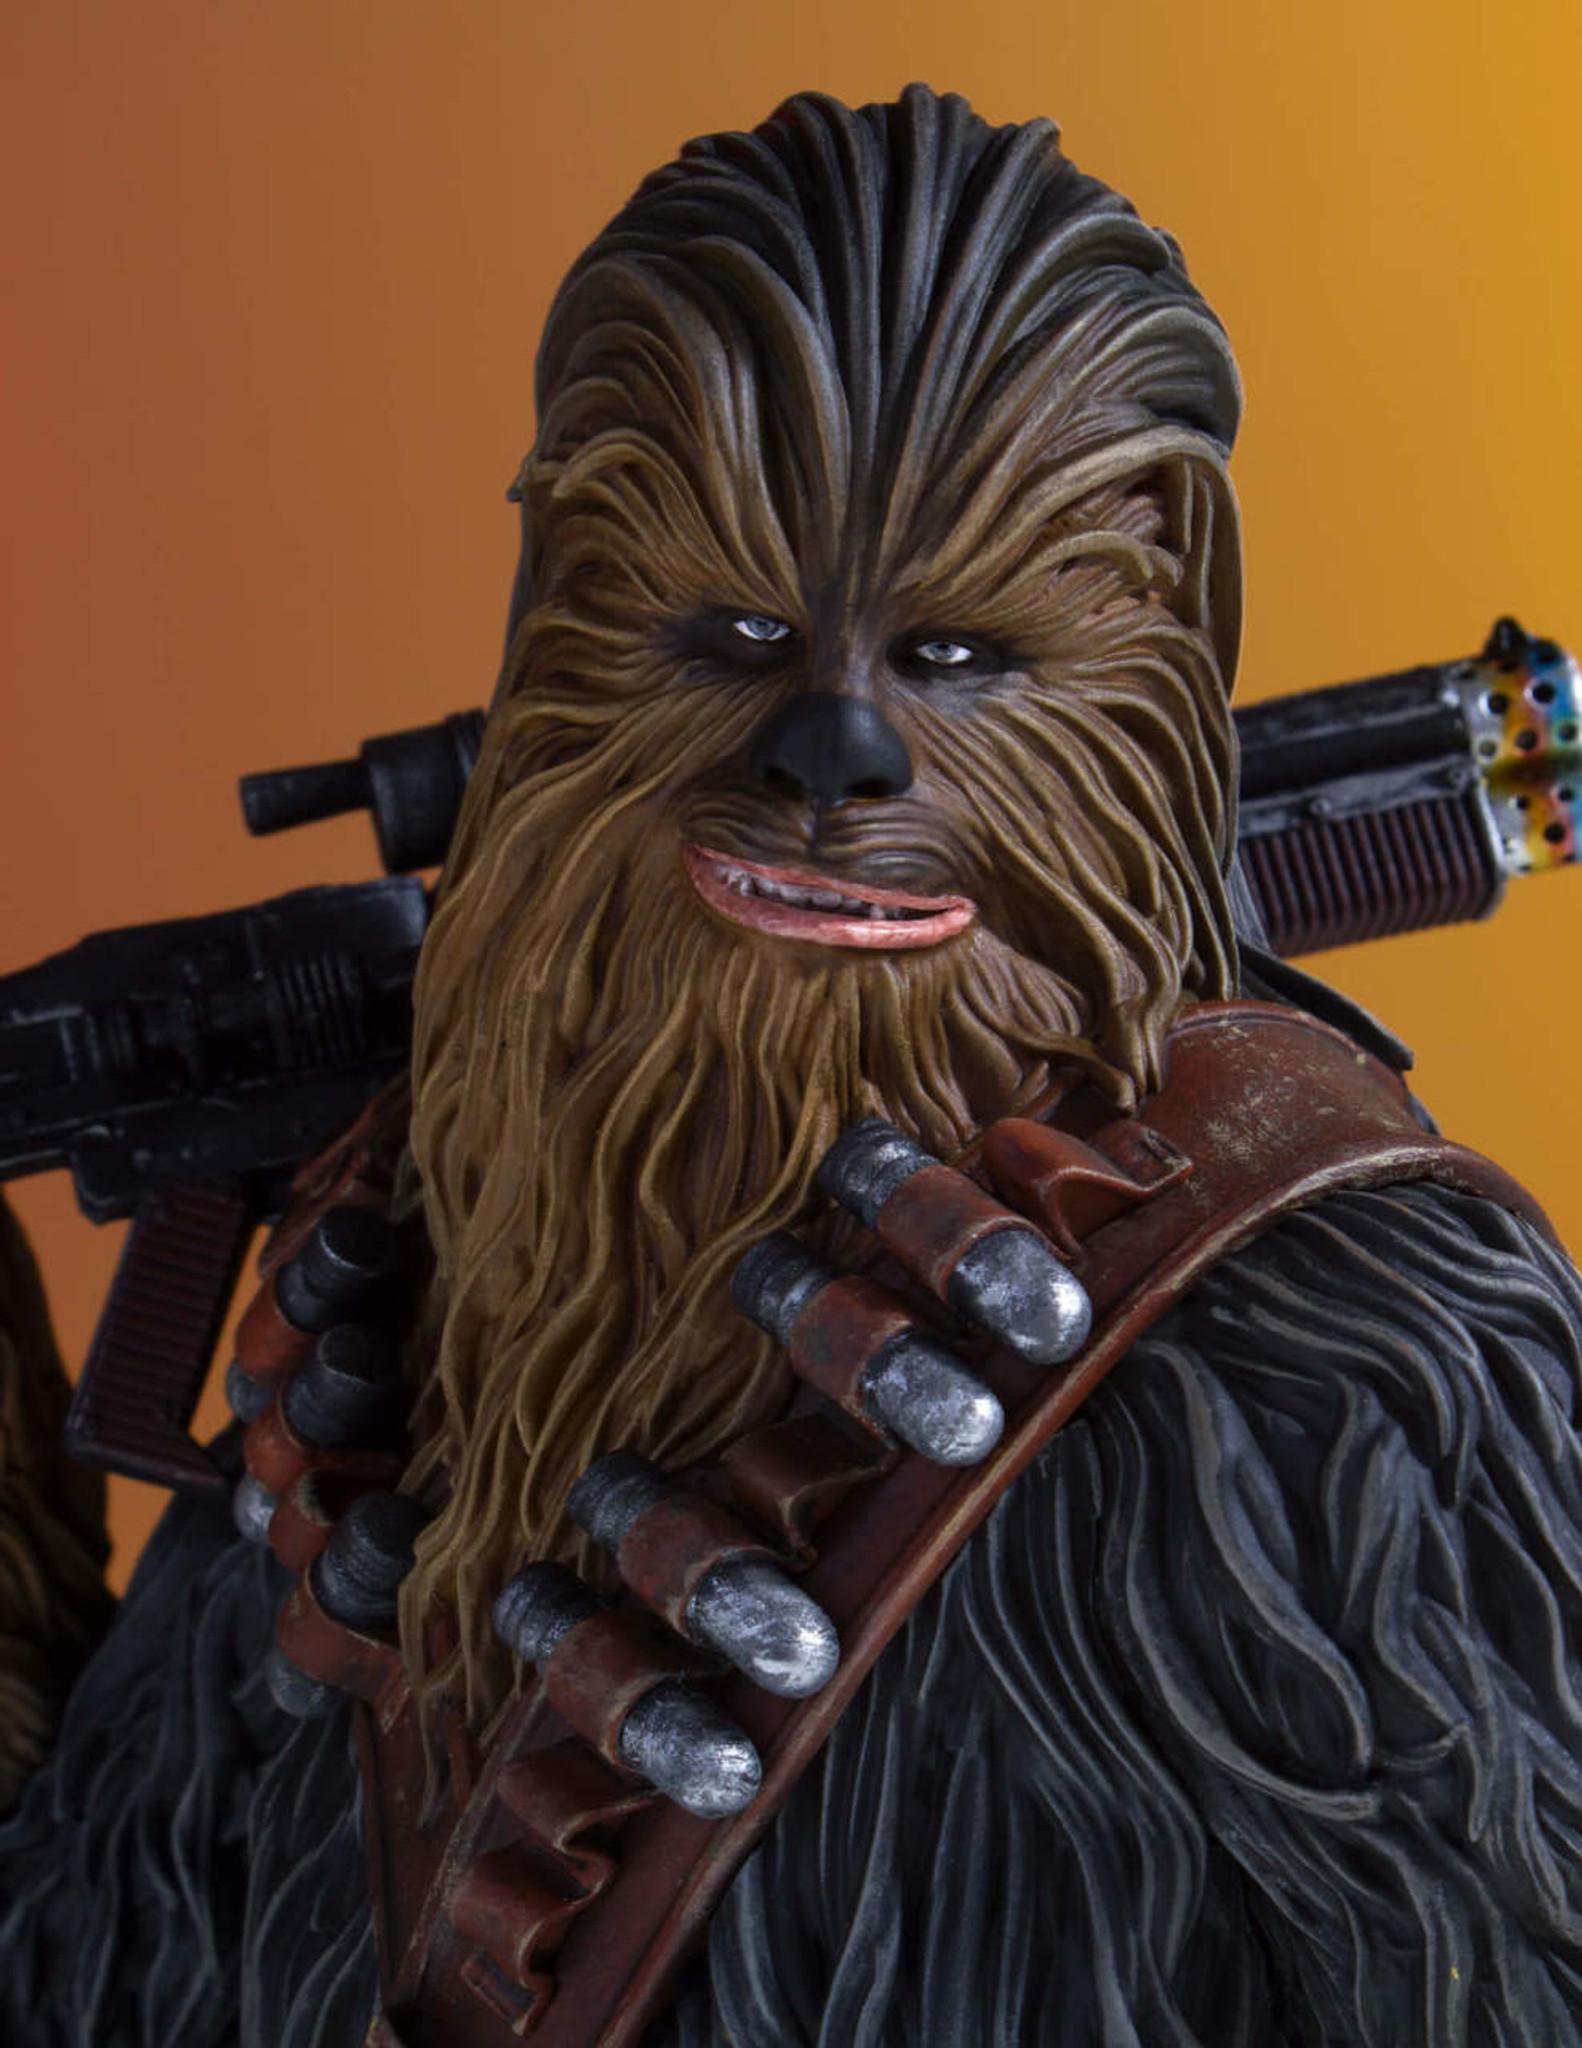 chewbacca solo a star wars story mini bust gentle giant ltd